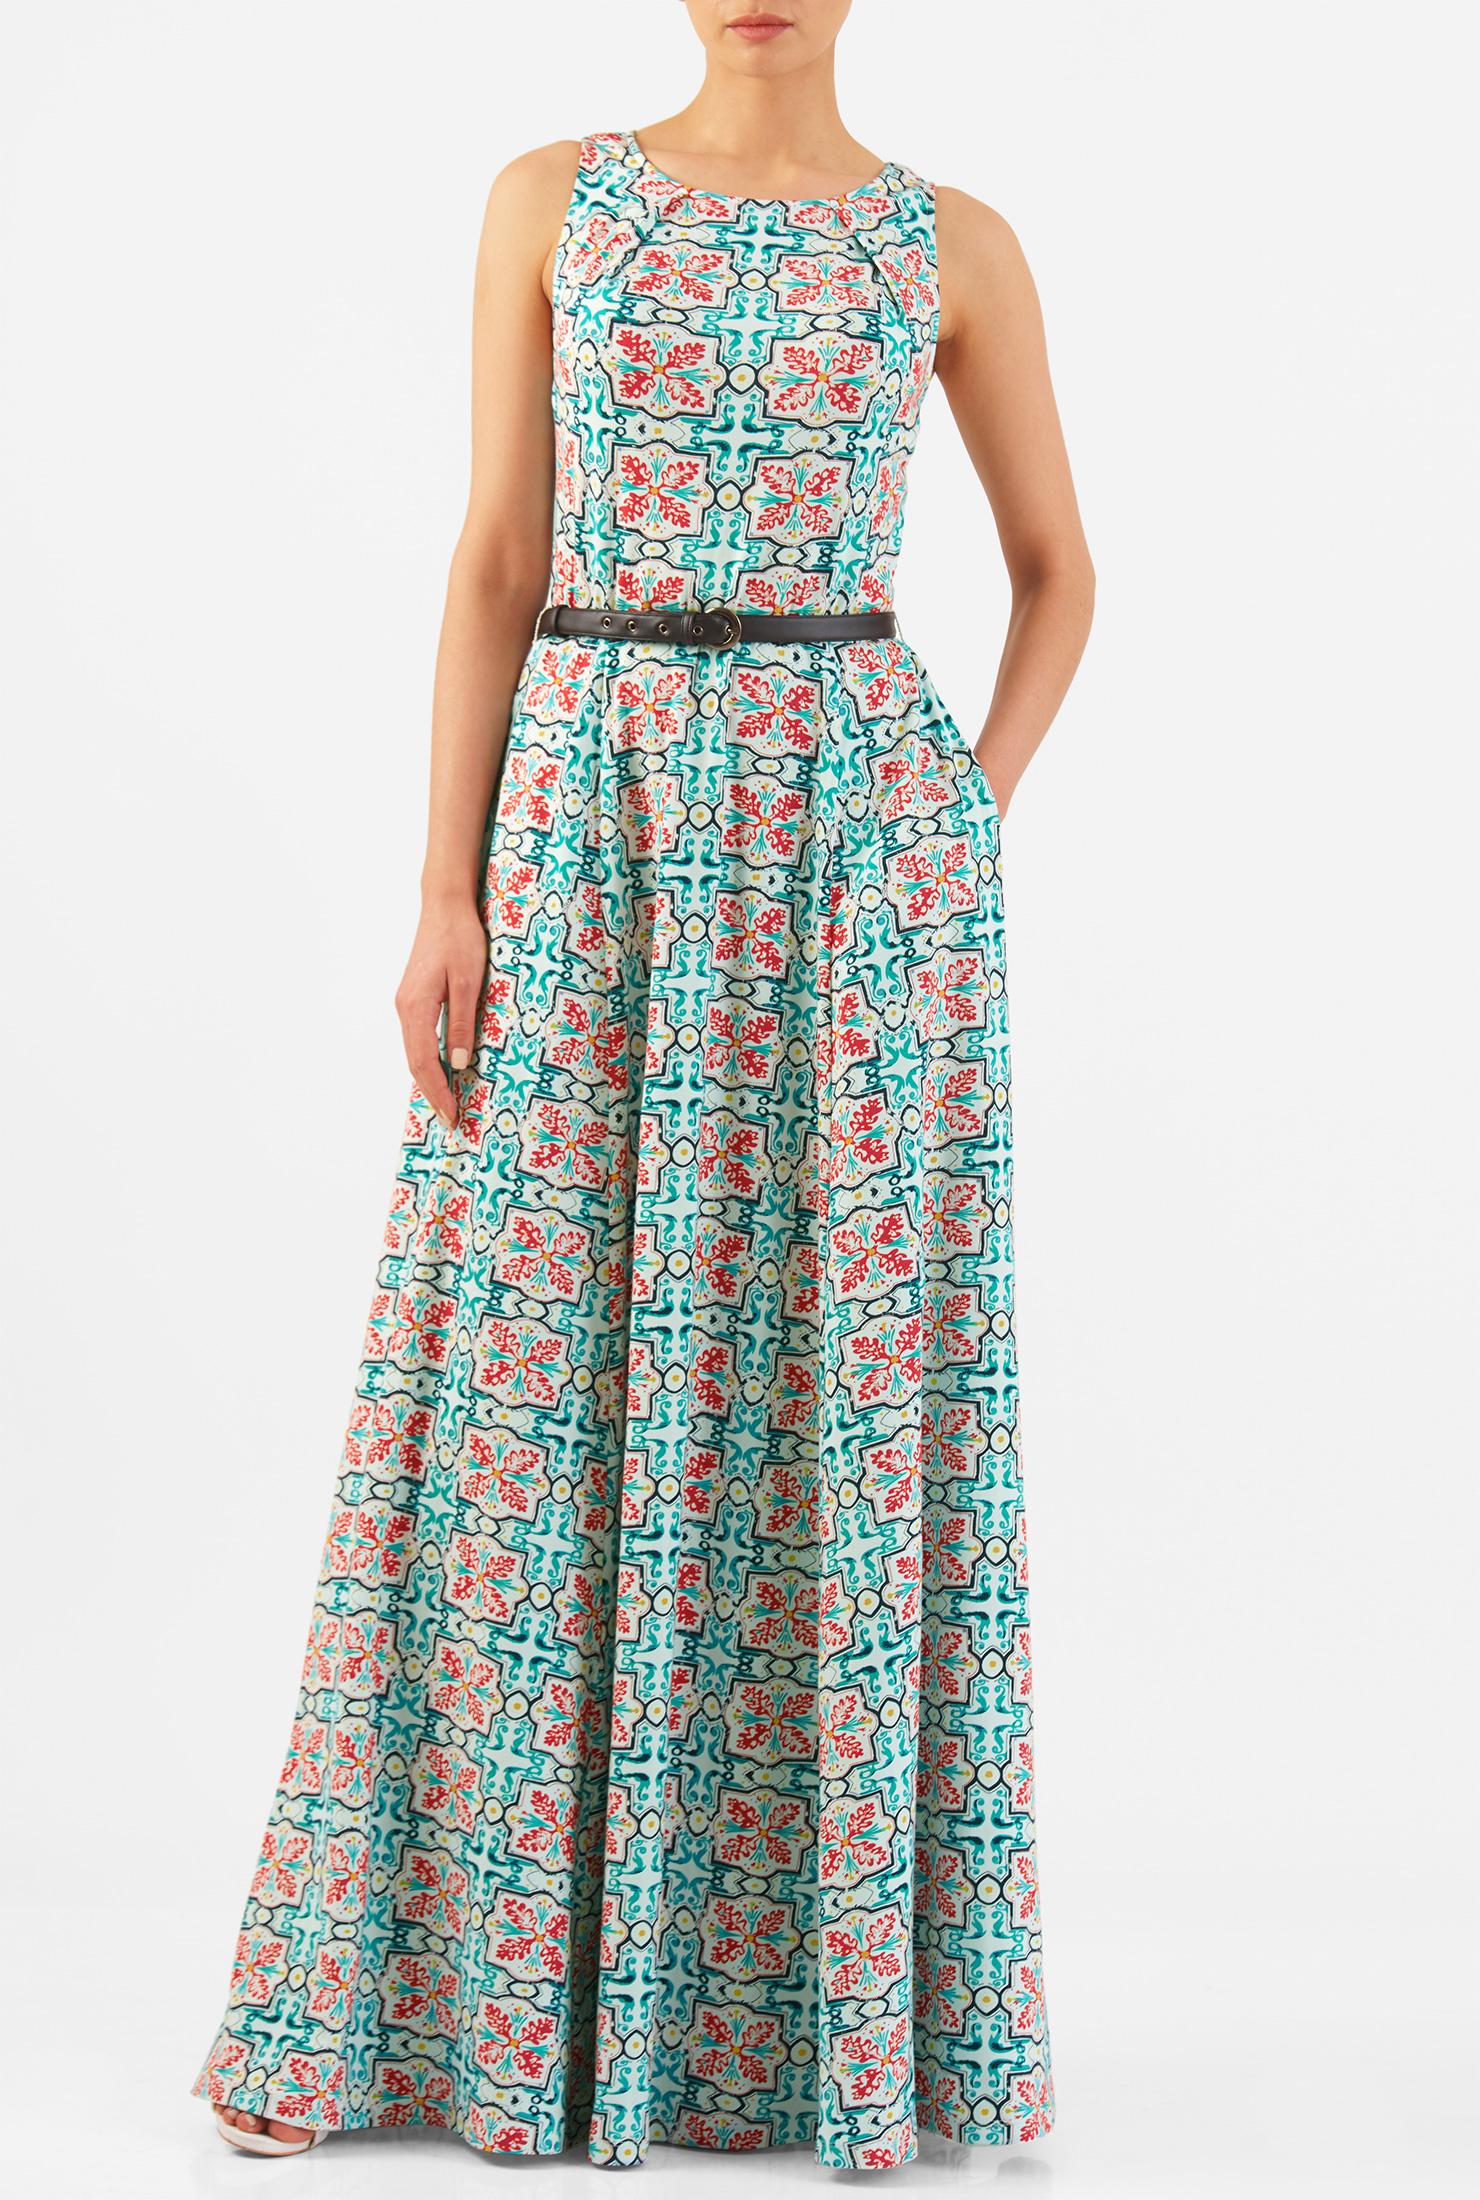 38a63a3734 Women s Fashion Clothing 0-36W and Custom